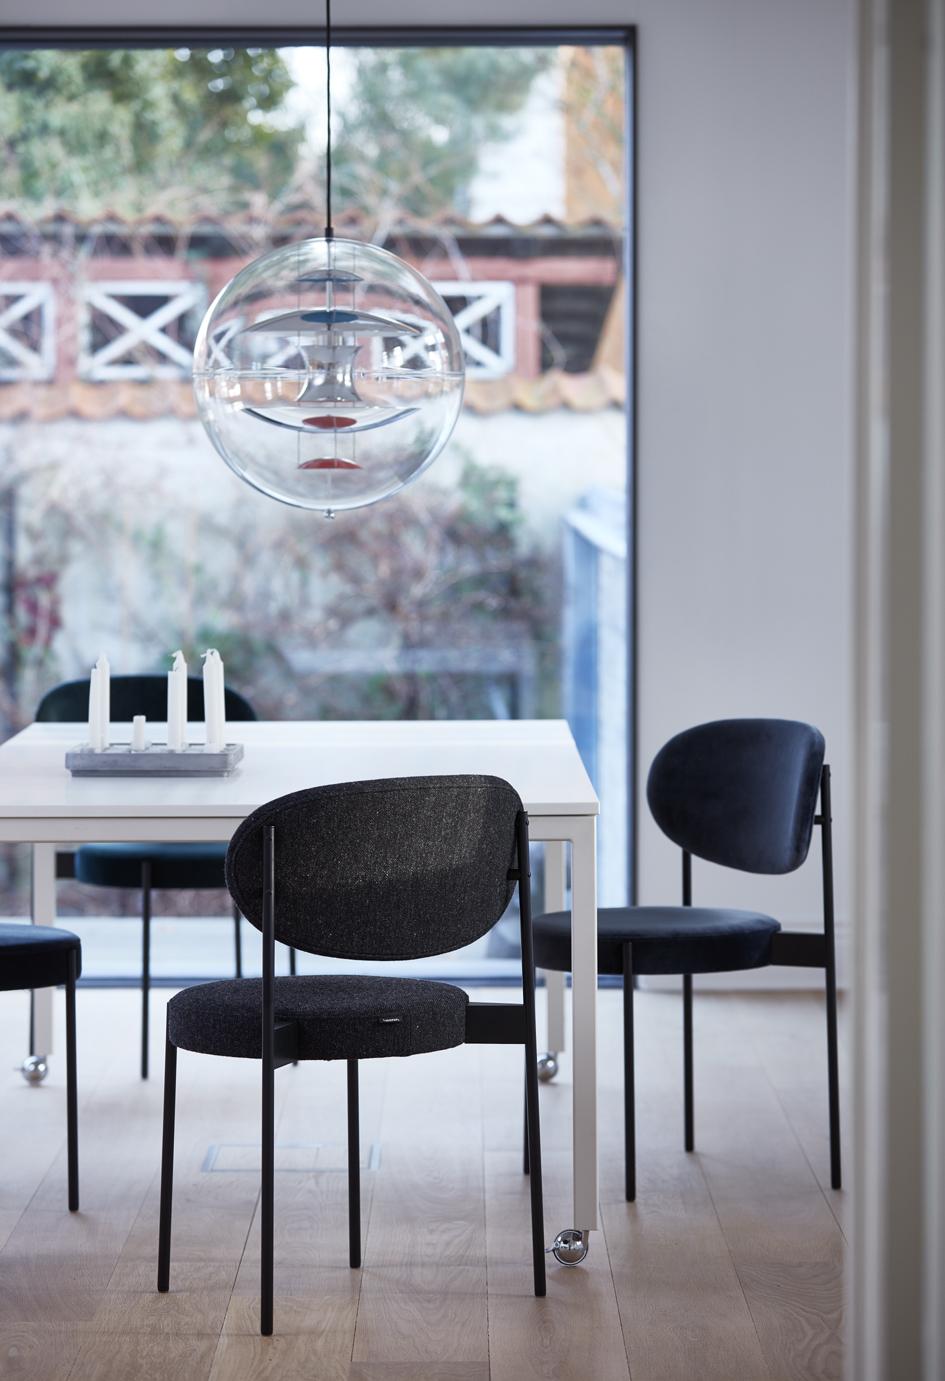 SERIES 430 by Verpan - Design Verner Panton